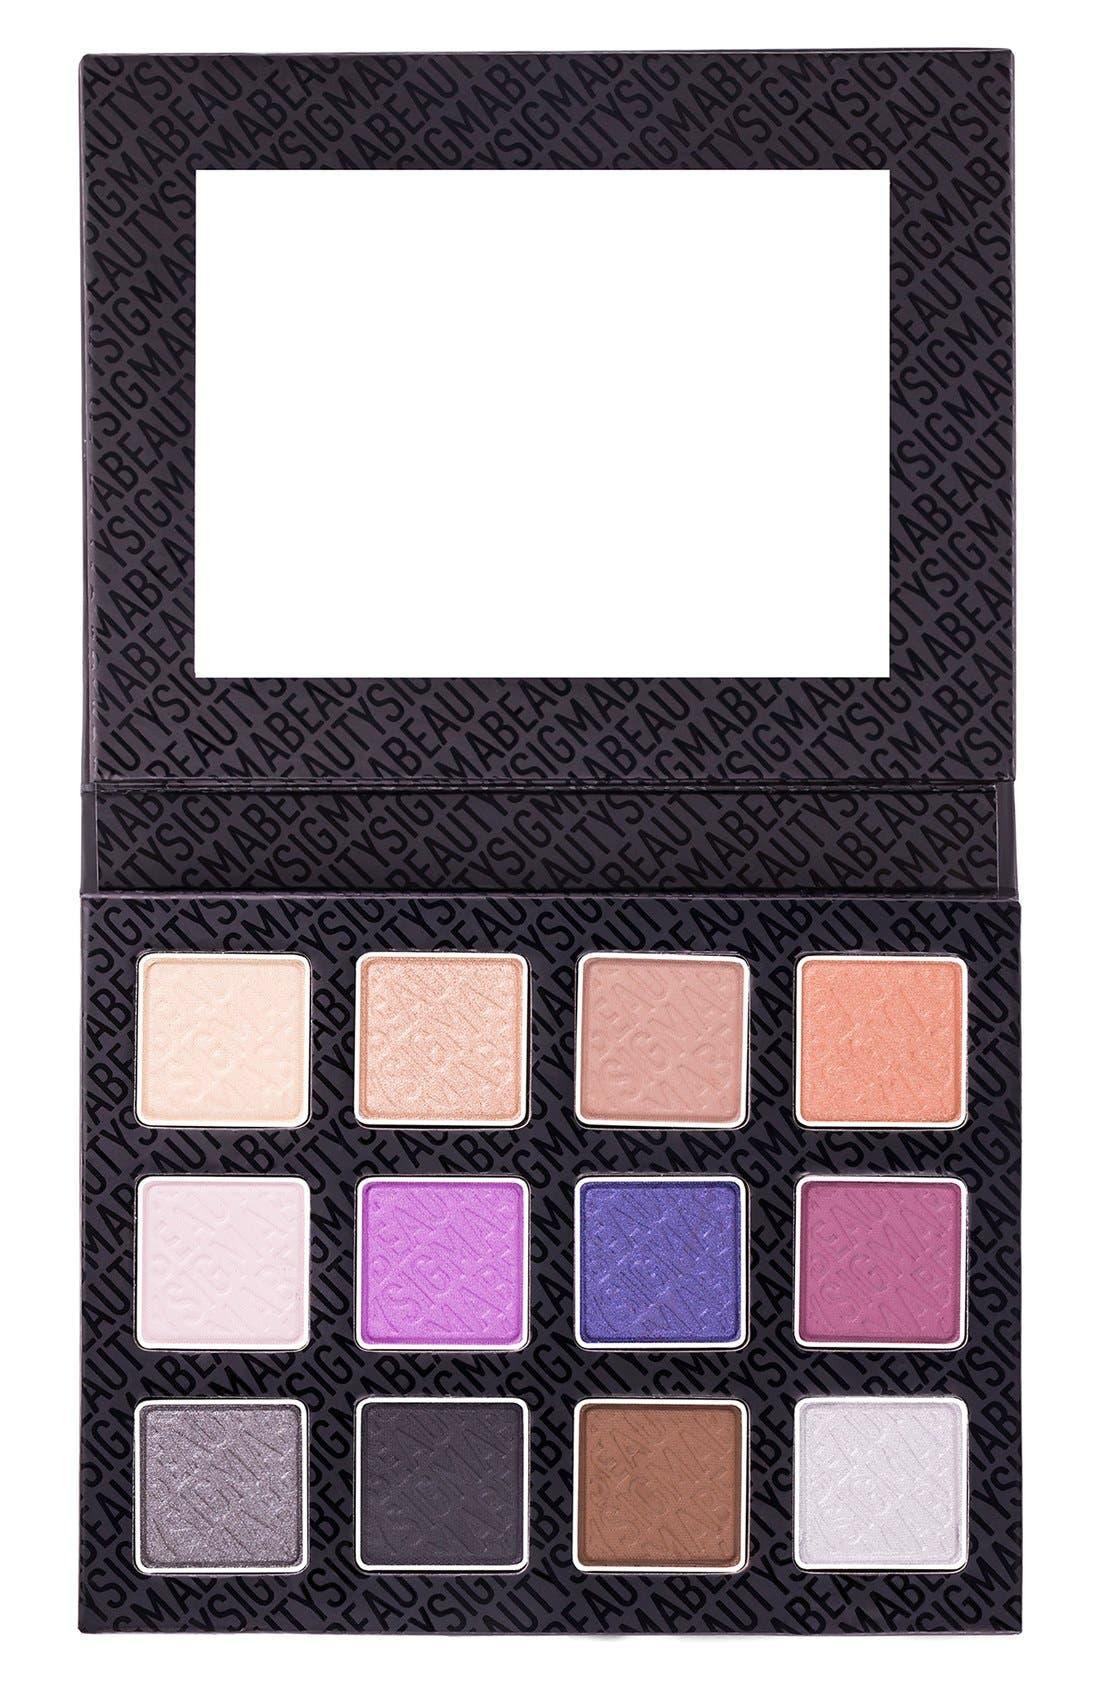 Sigma Beauty 'Nightlife' Eyeshadow Palette